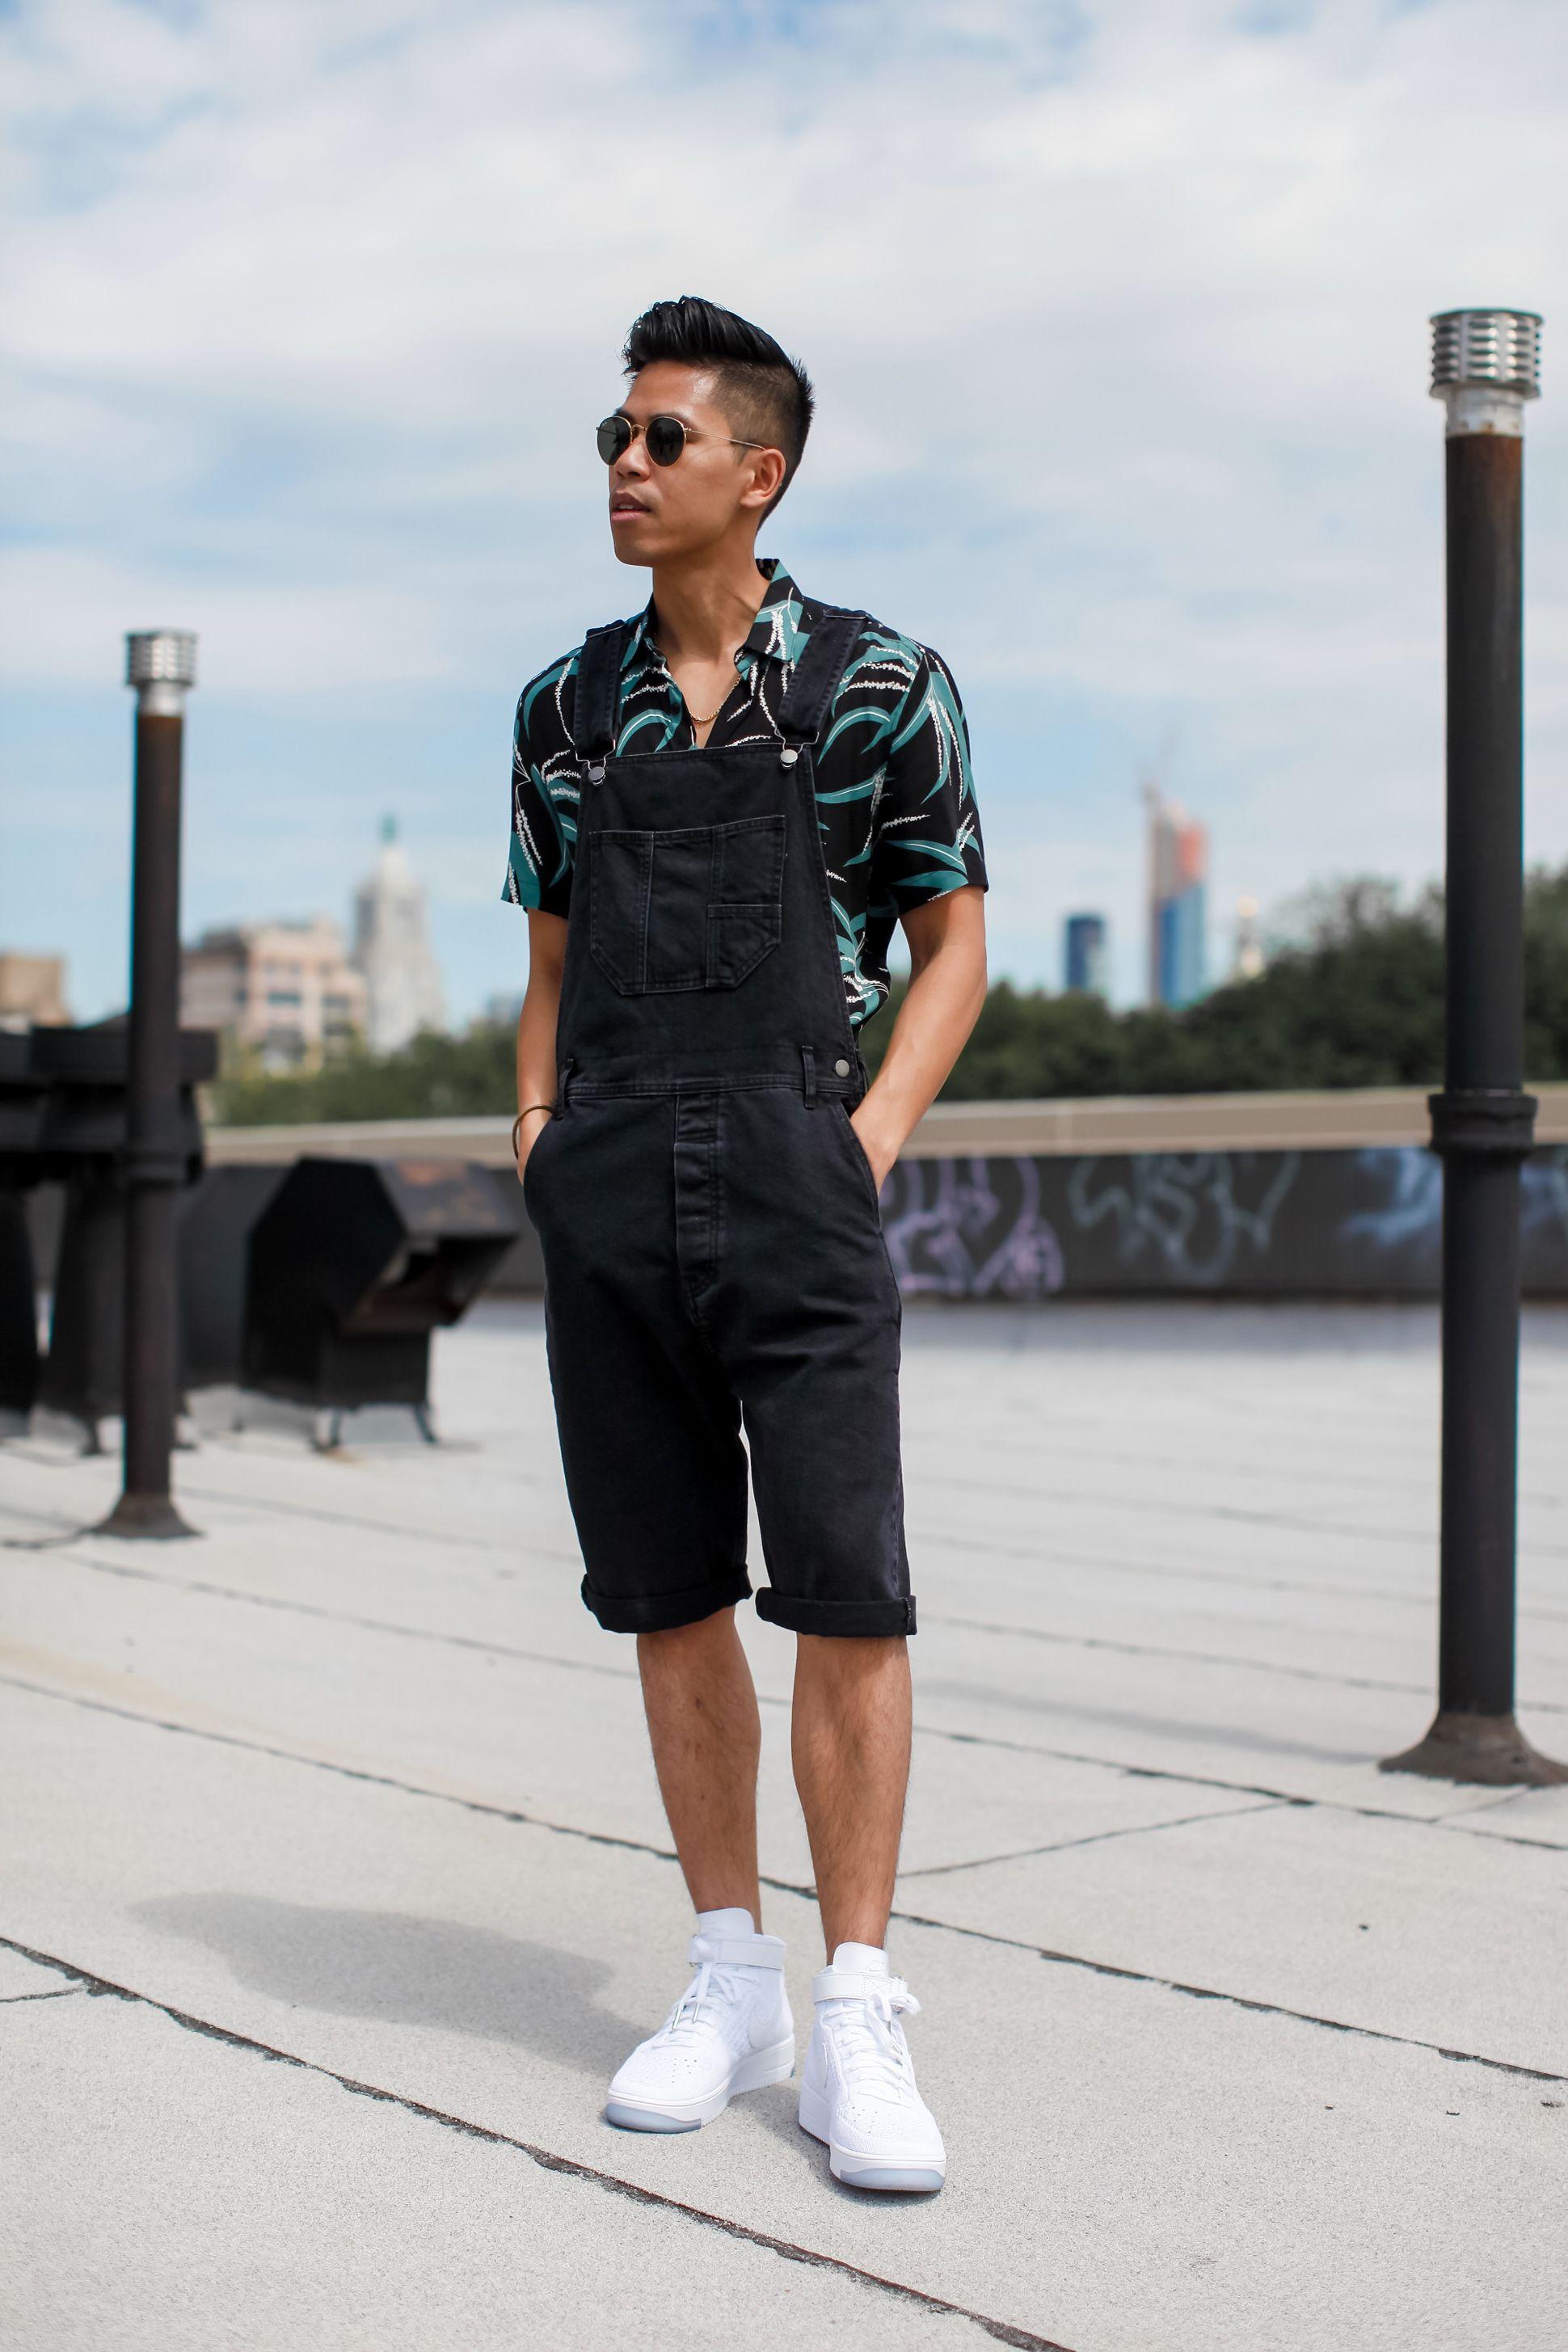 Youth Men Retro Denim Overalls Korea Style Fashion Casual Short Sleeve Dungarees